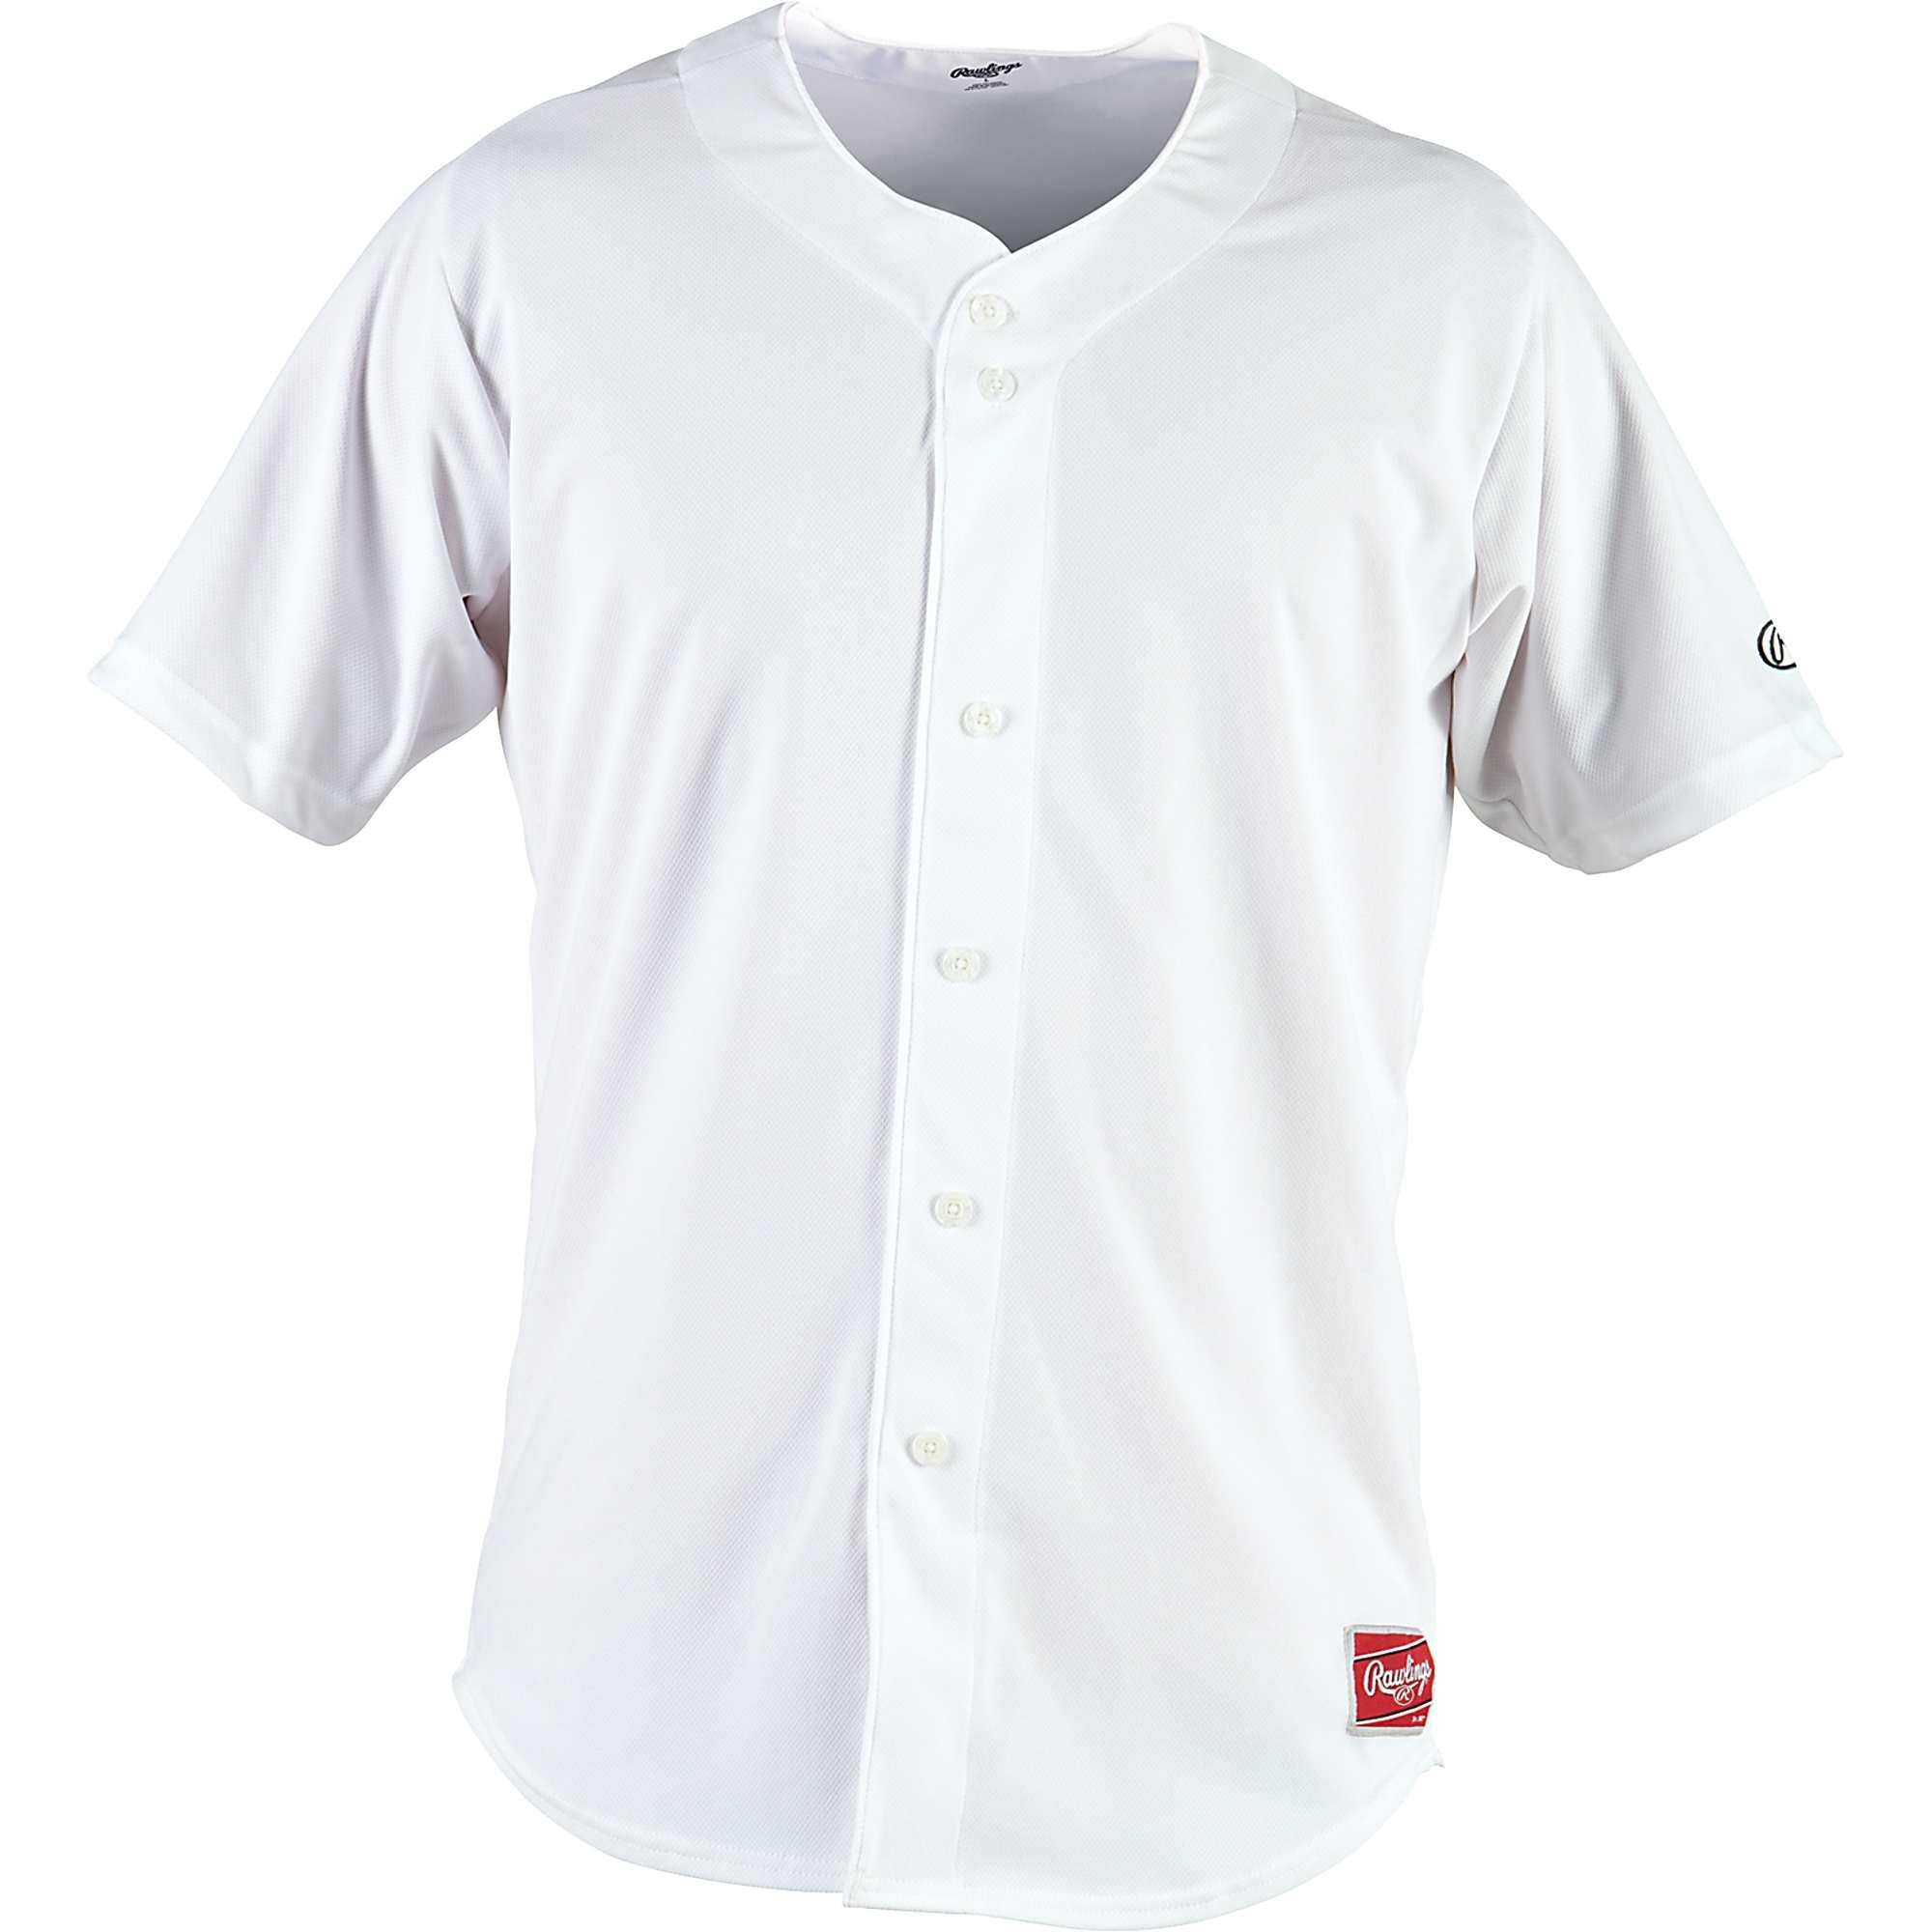 rawlings men 39 s faux button baseball jersey ebay. Black Bedroom Furniture Sets. Home Design Ideas